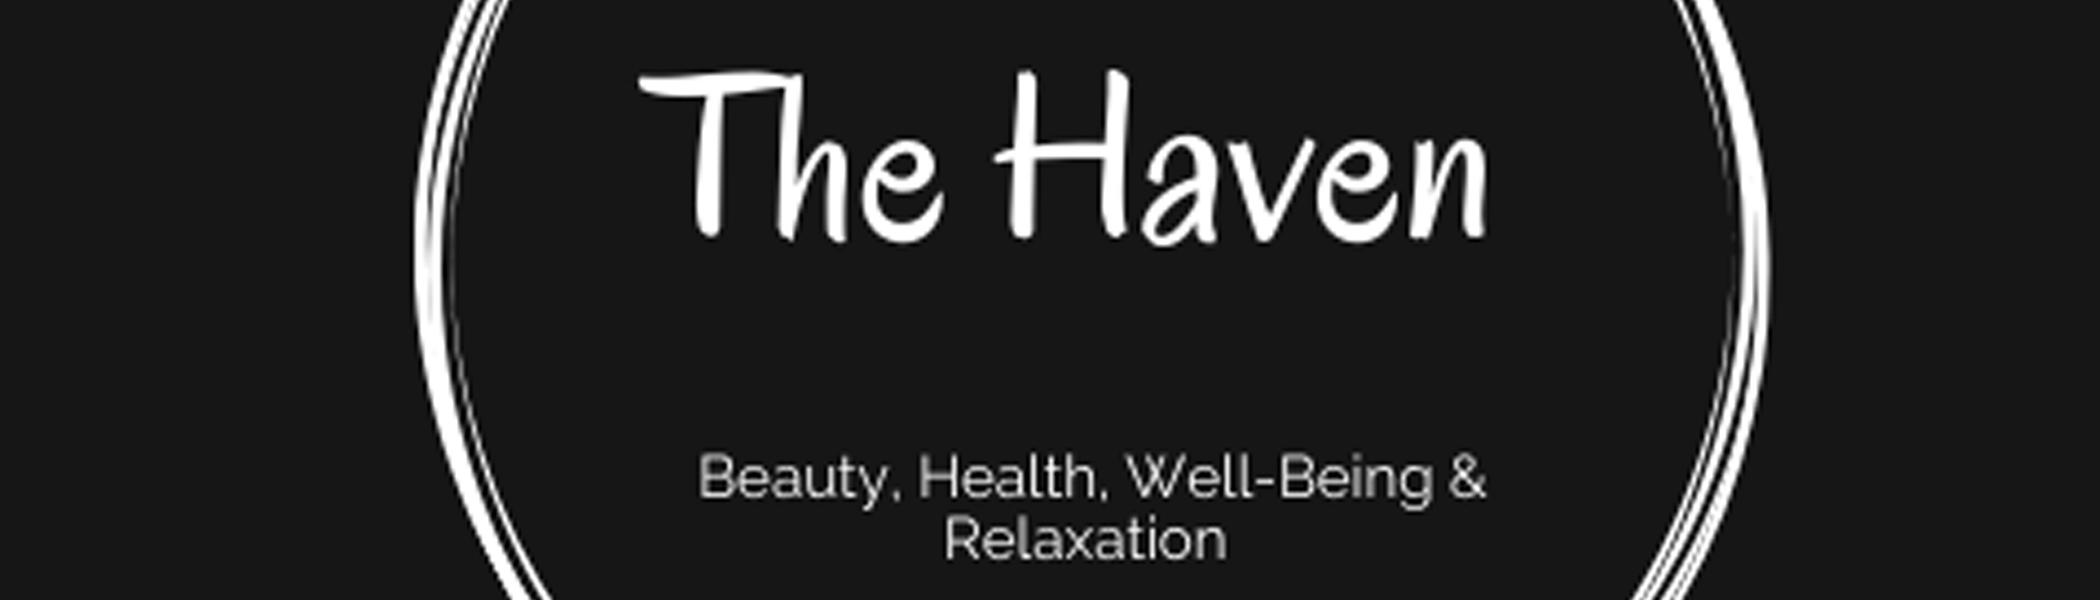 Haven_Beauty_Alexandria_Vale_of_Leven